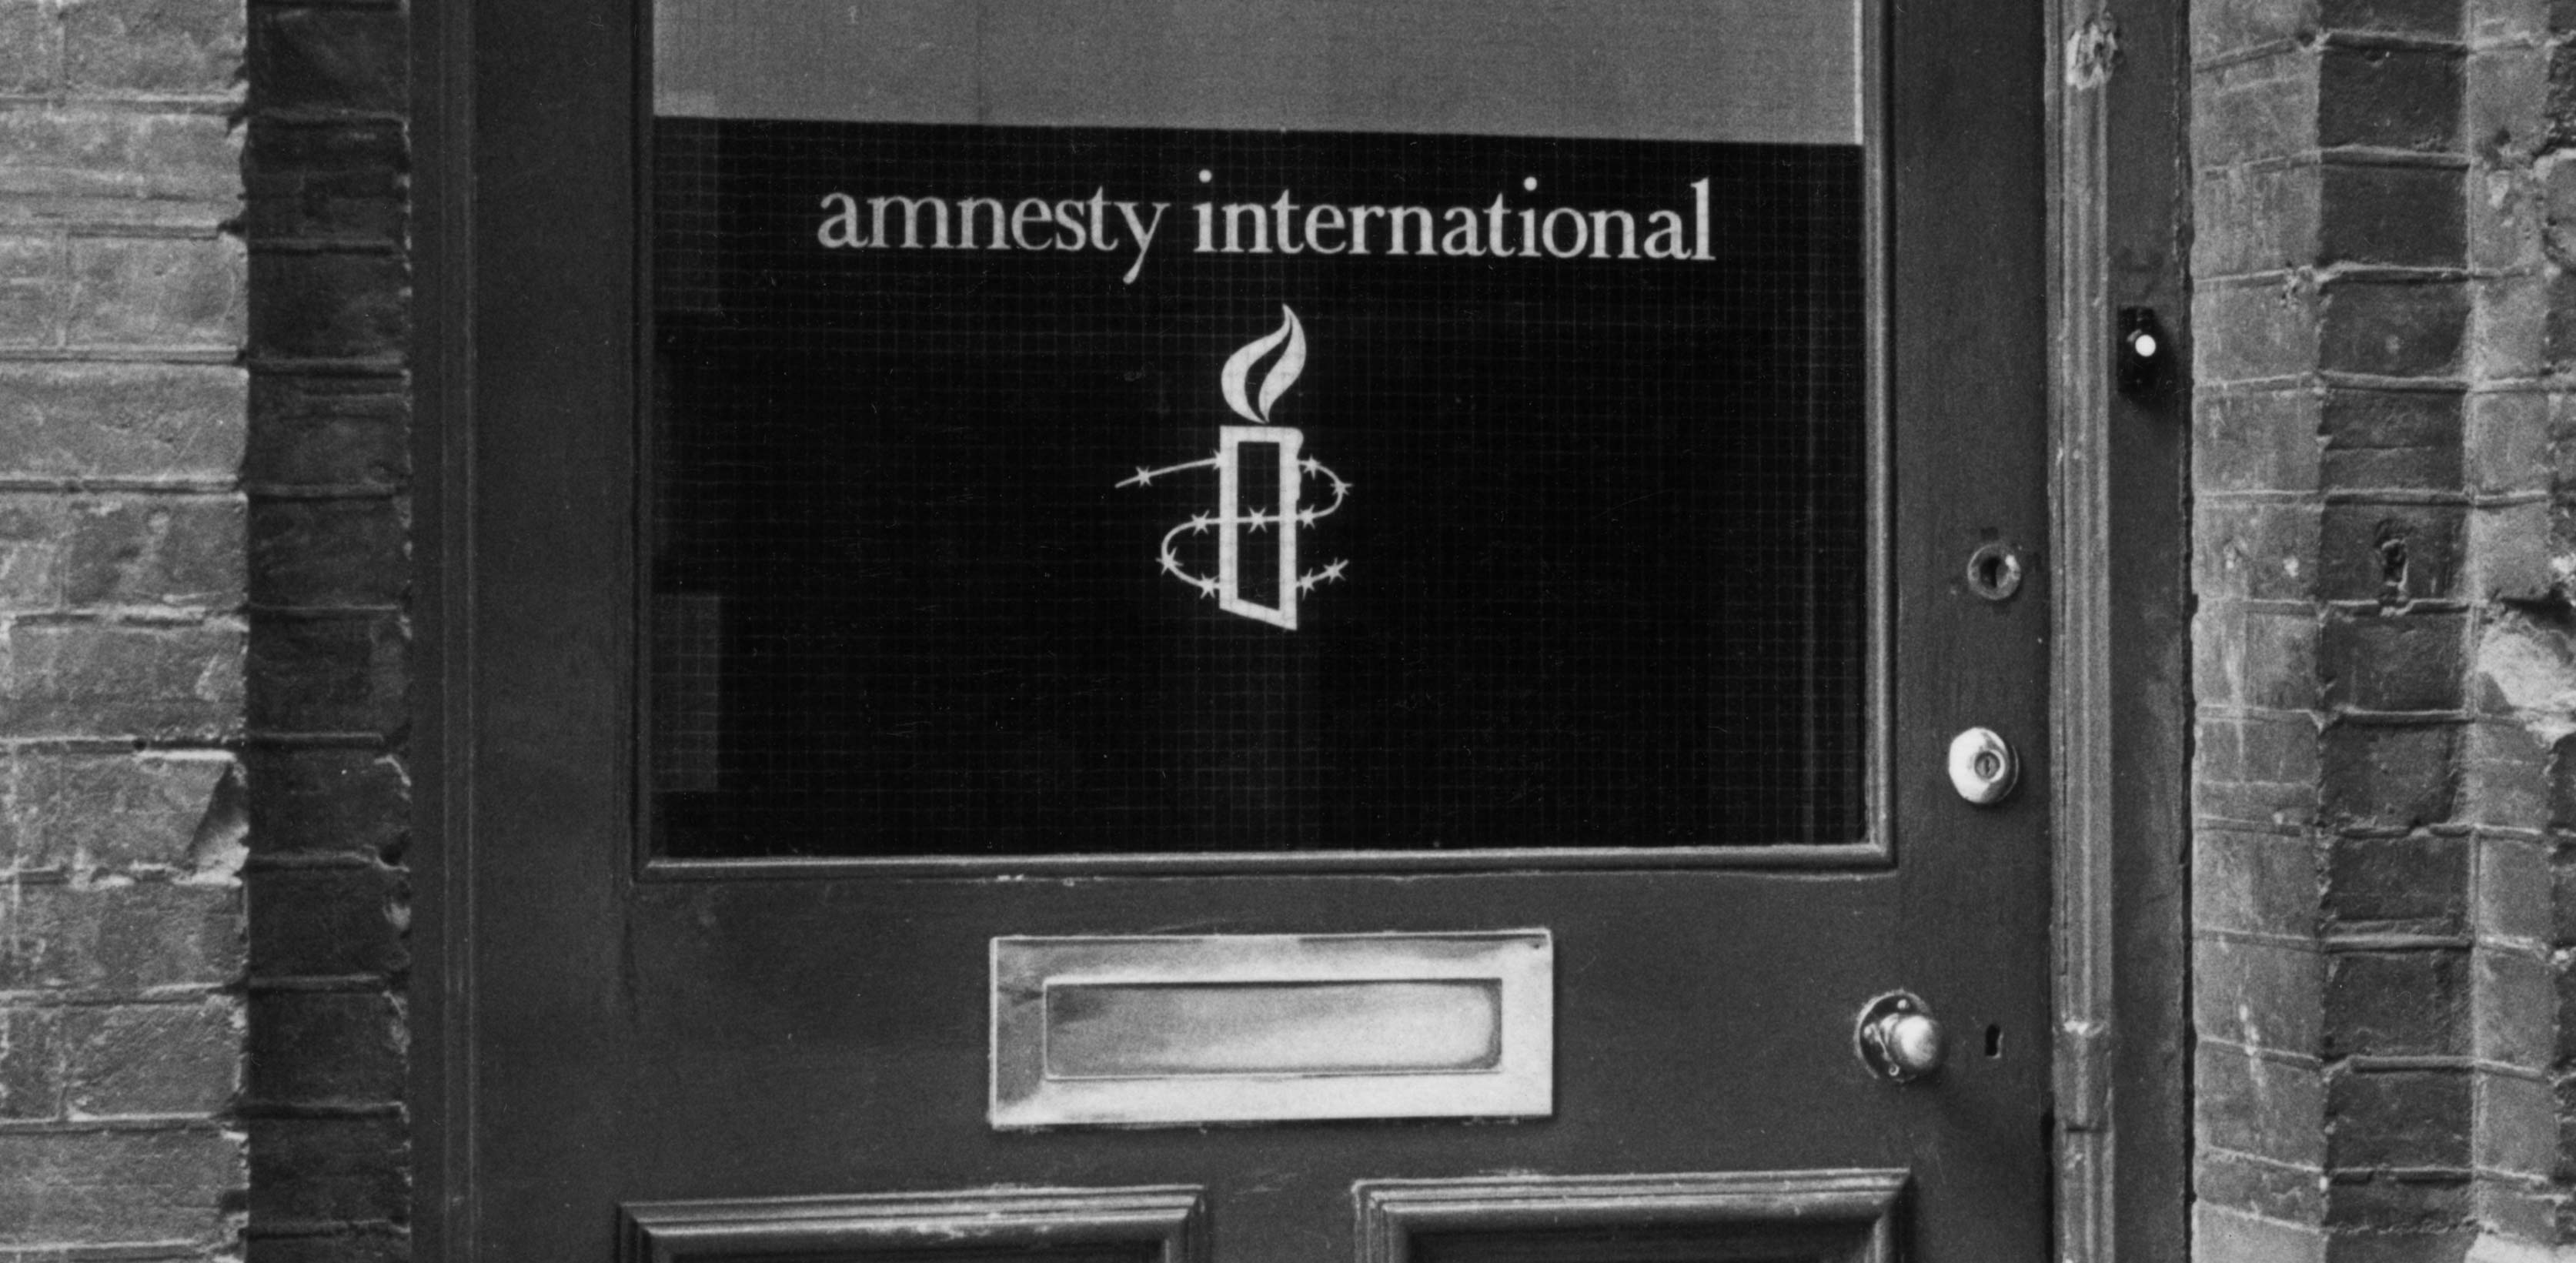 The story behind Amnesty International